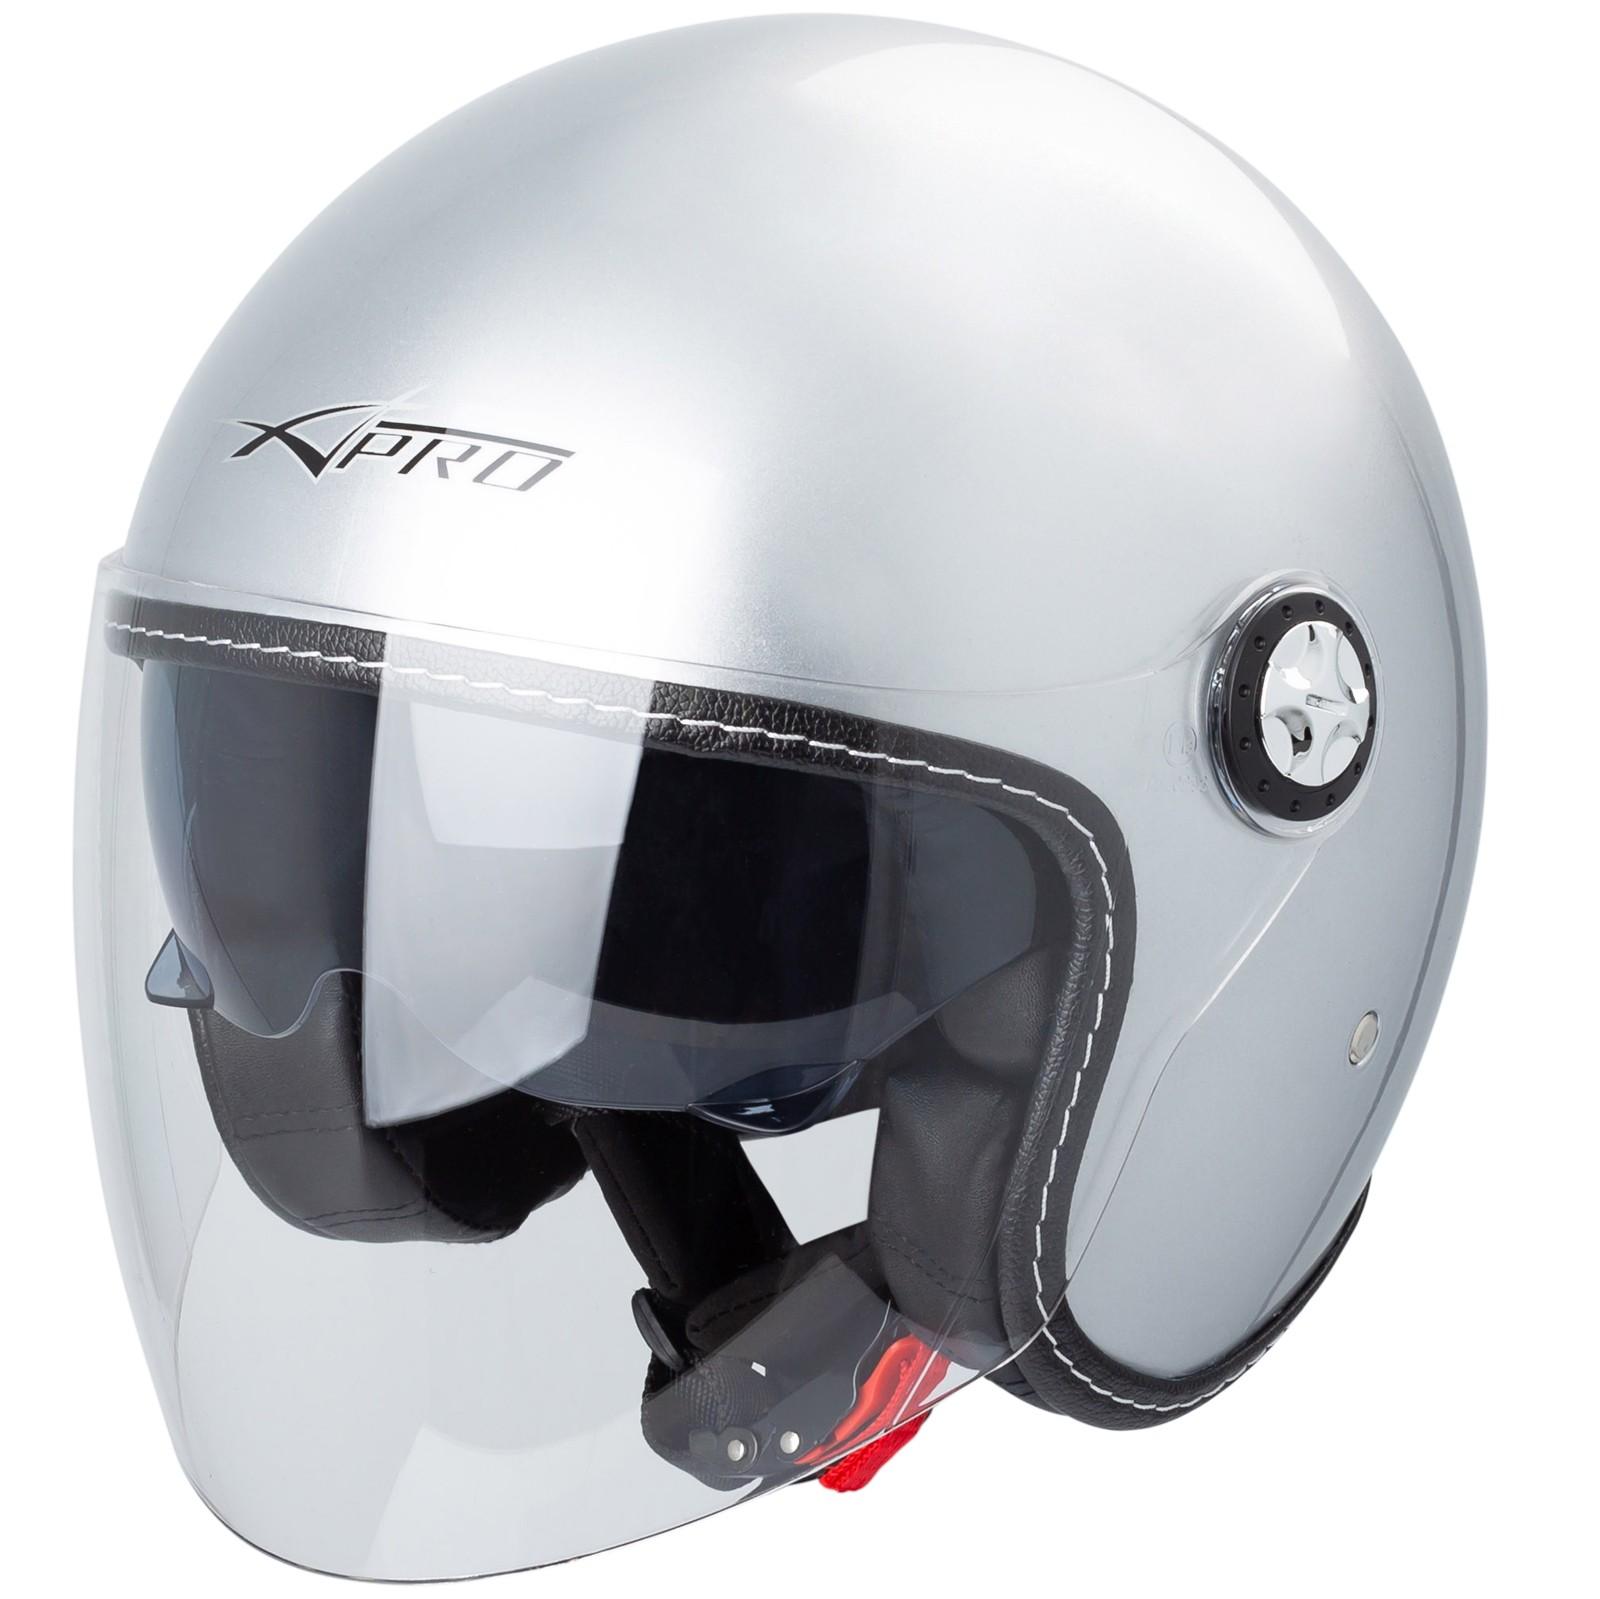 BOSTON_Casco_Helmet_Moto_Motorcycle_black_A-Pro